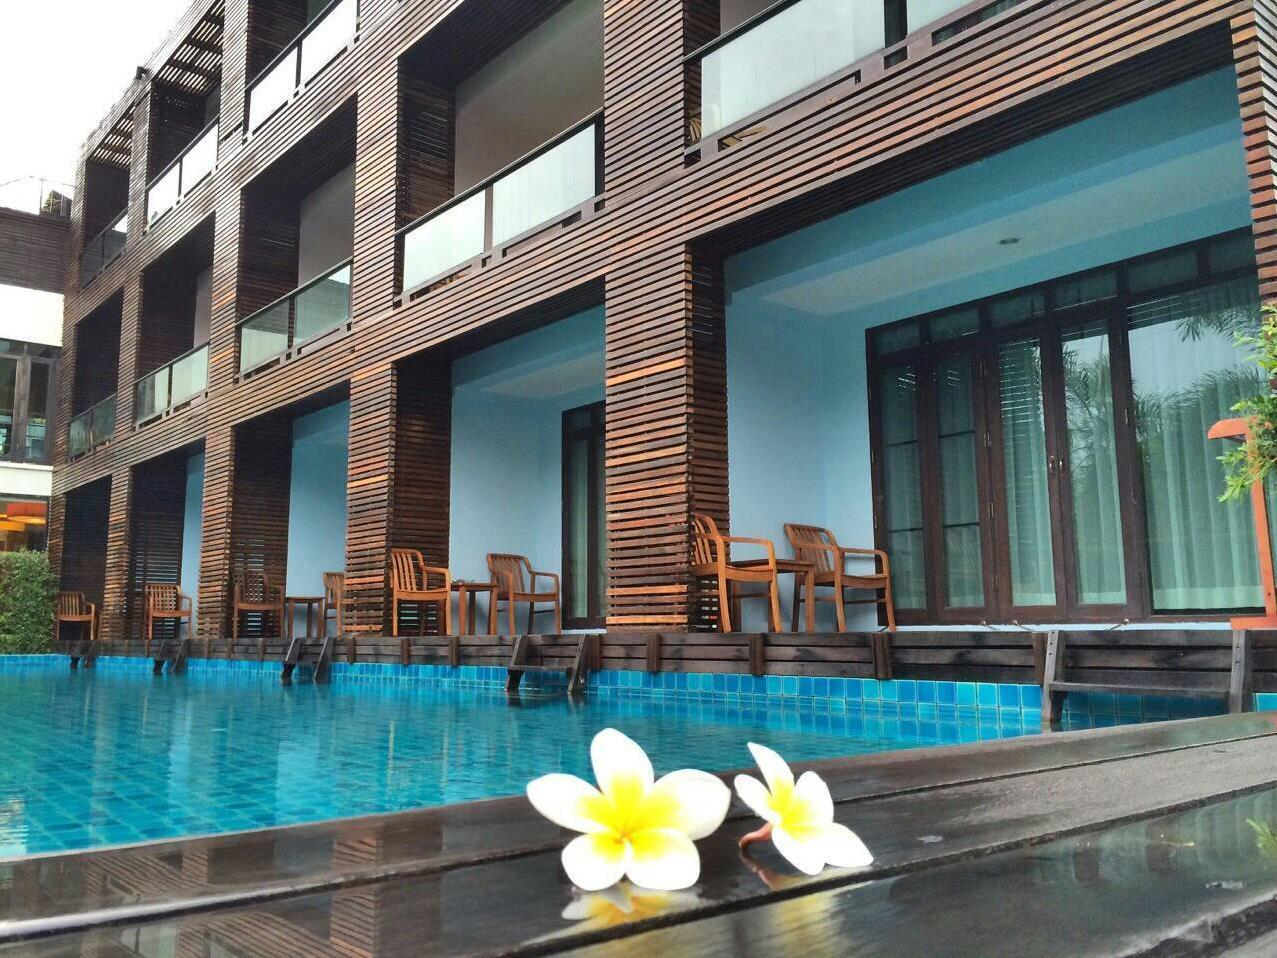 The Bihai Hotel